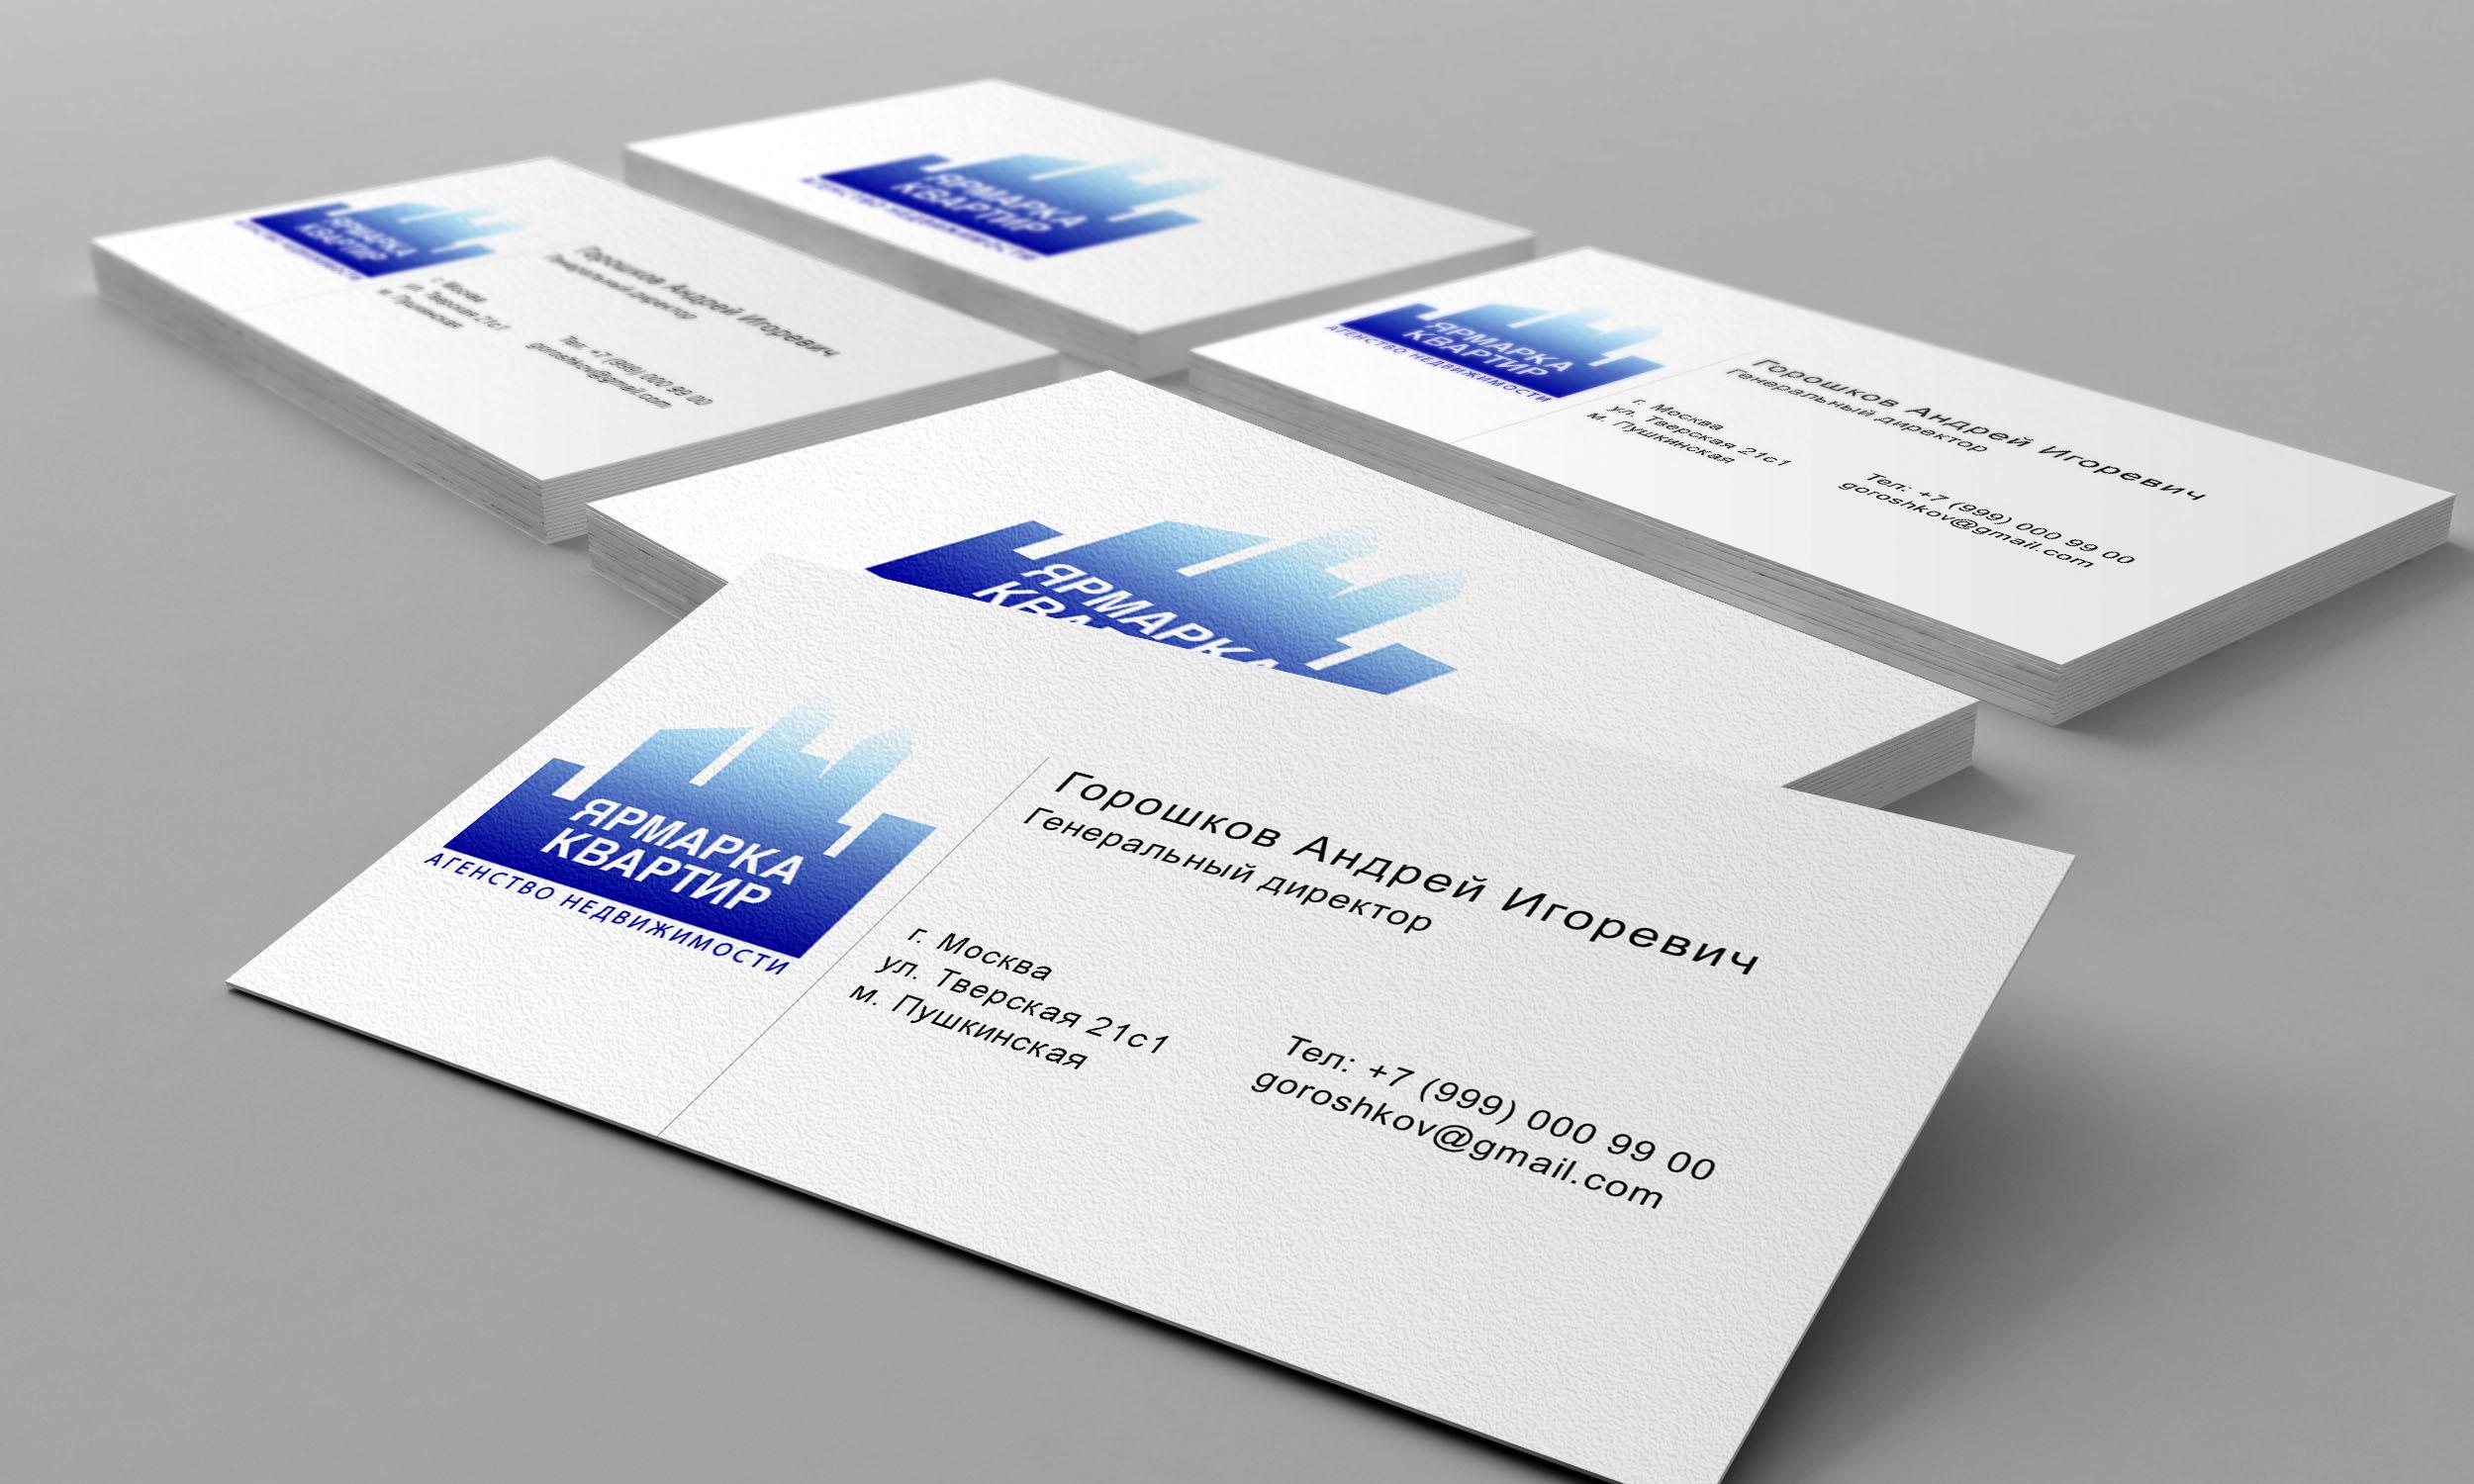 Создание логотипа, с вариантами для визитки и листовки фото f_41460048c370cb54.jpg